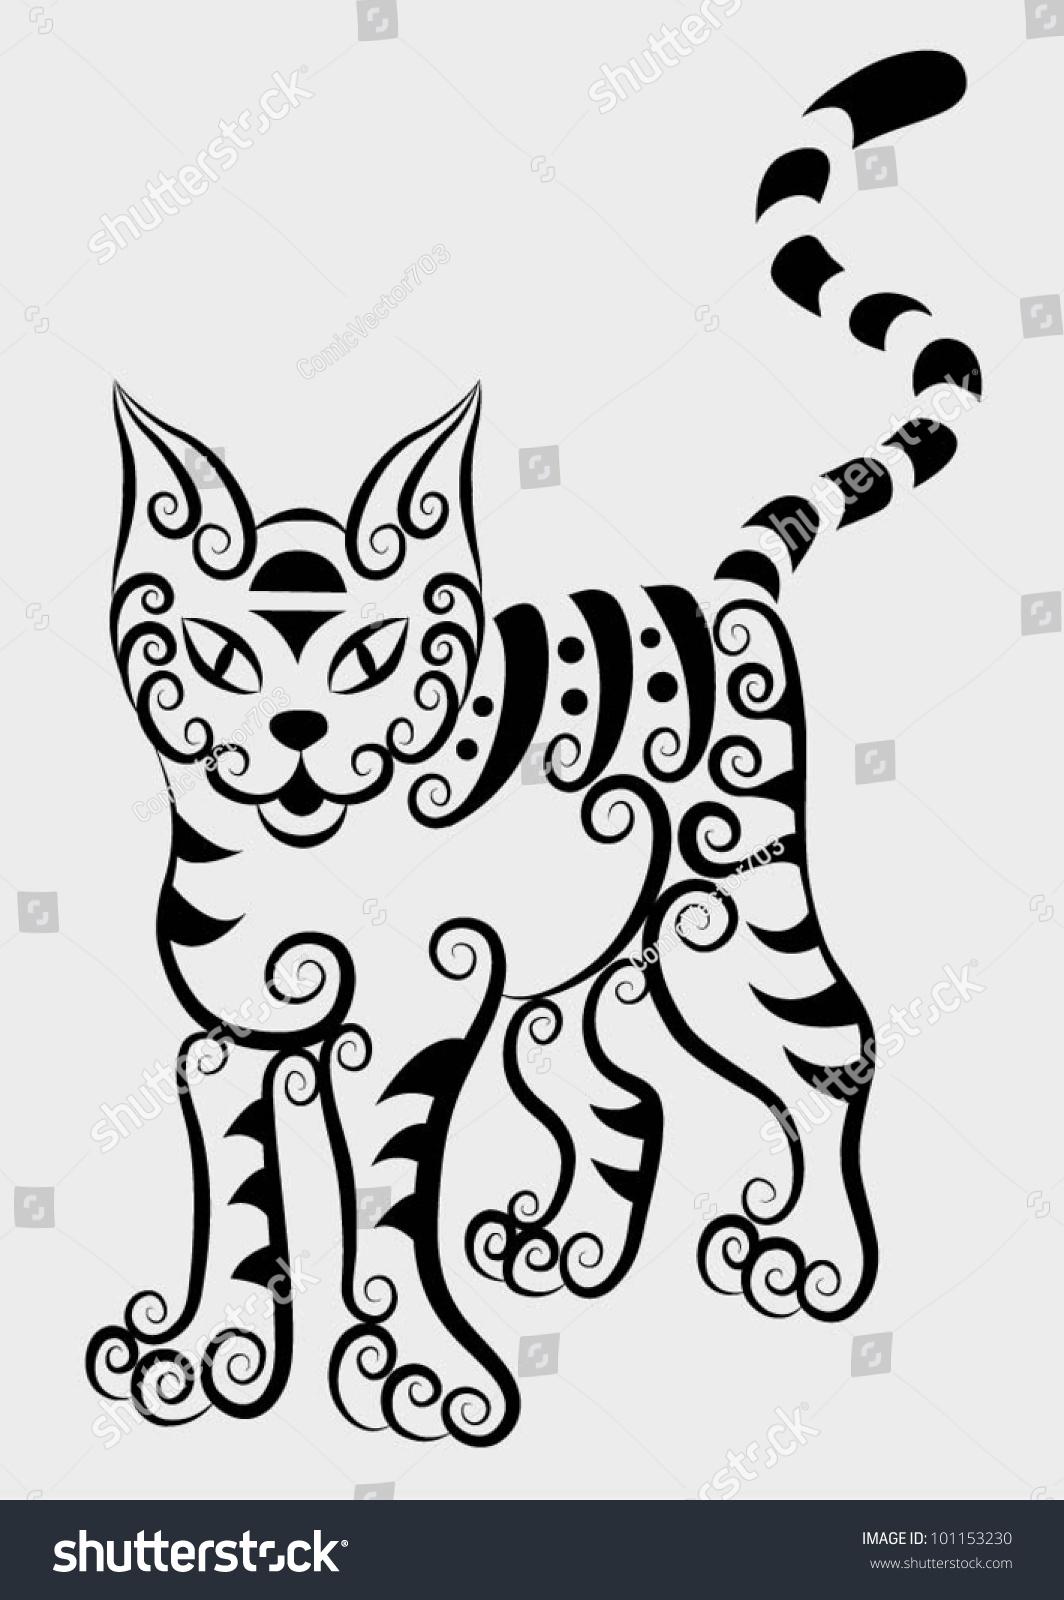 Decorative Cat 2 Animal Motif And Floral Ornament